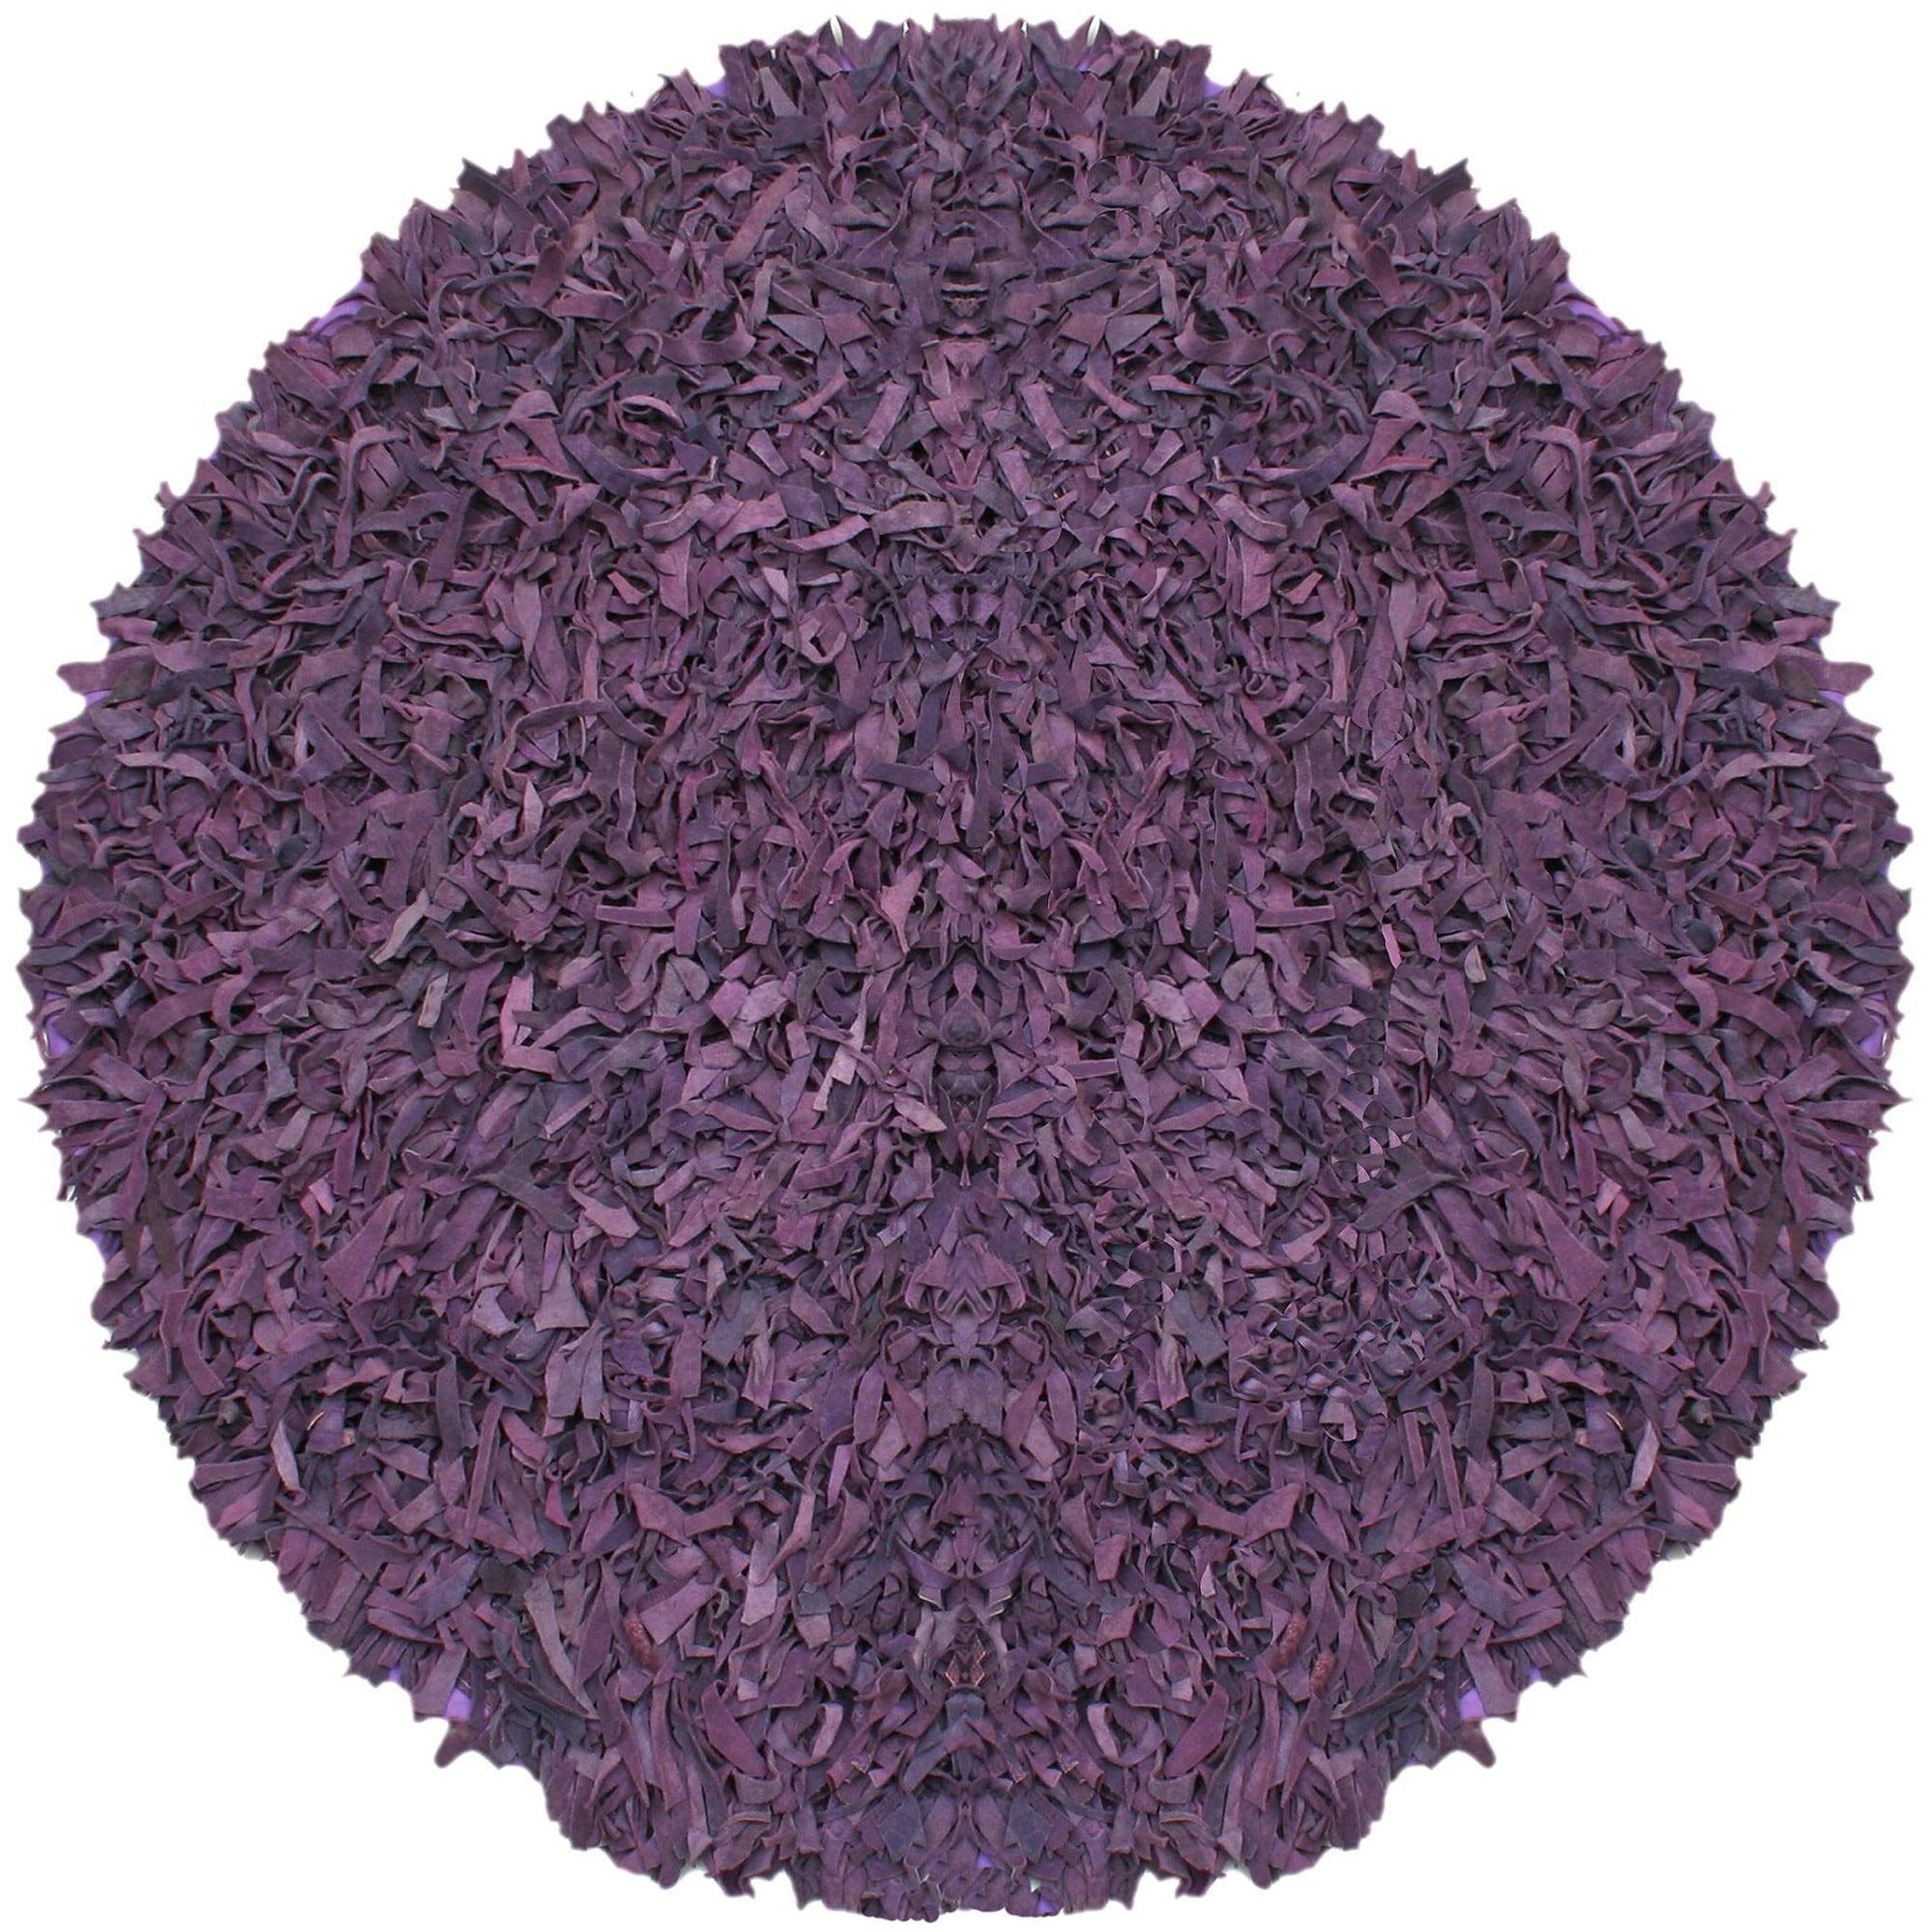 St. Croix Pelle Hand-tied Purple Leather Shag Rug (4' Rou...